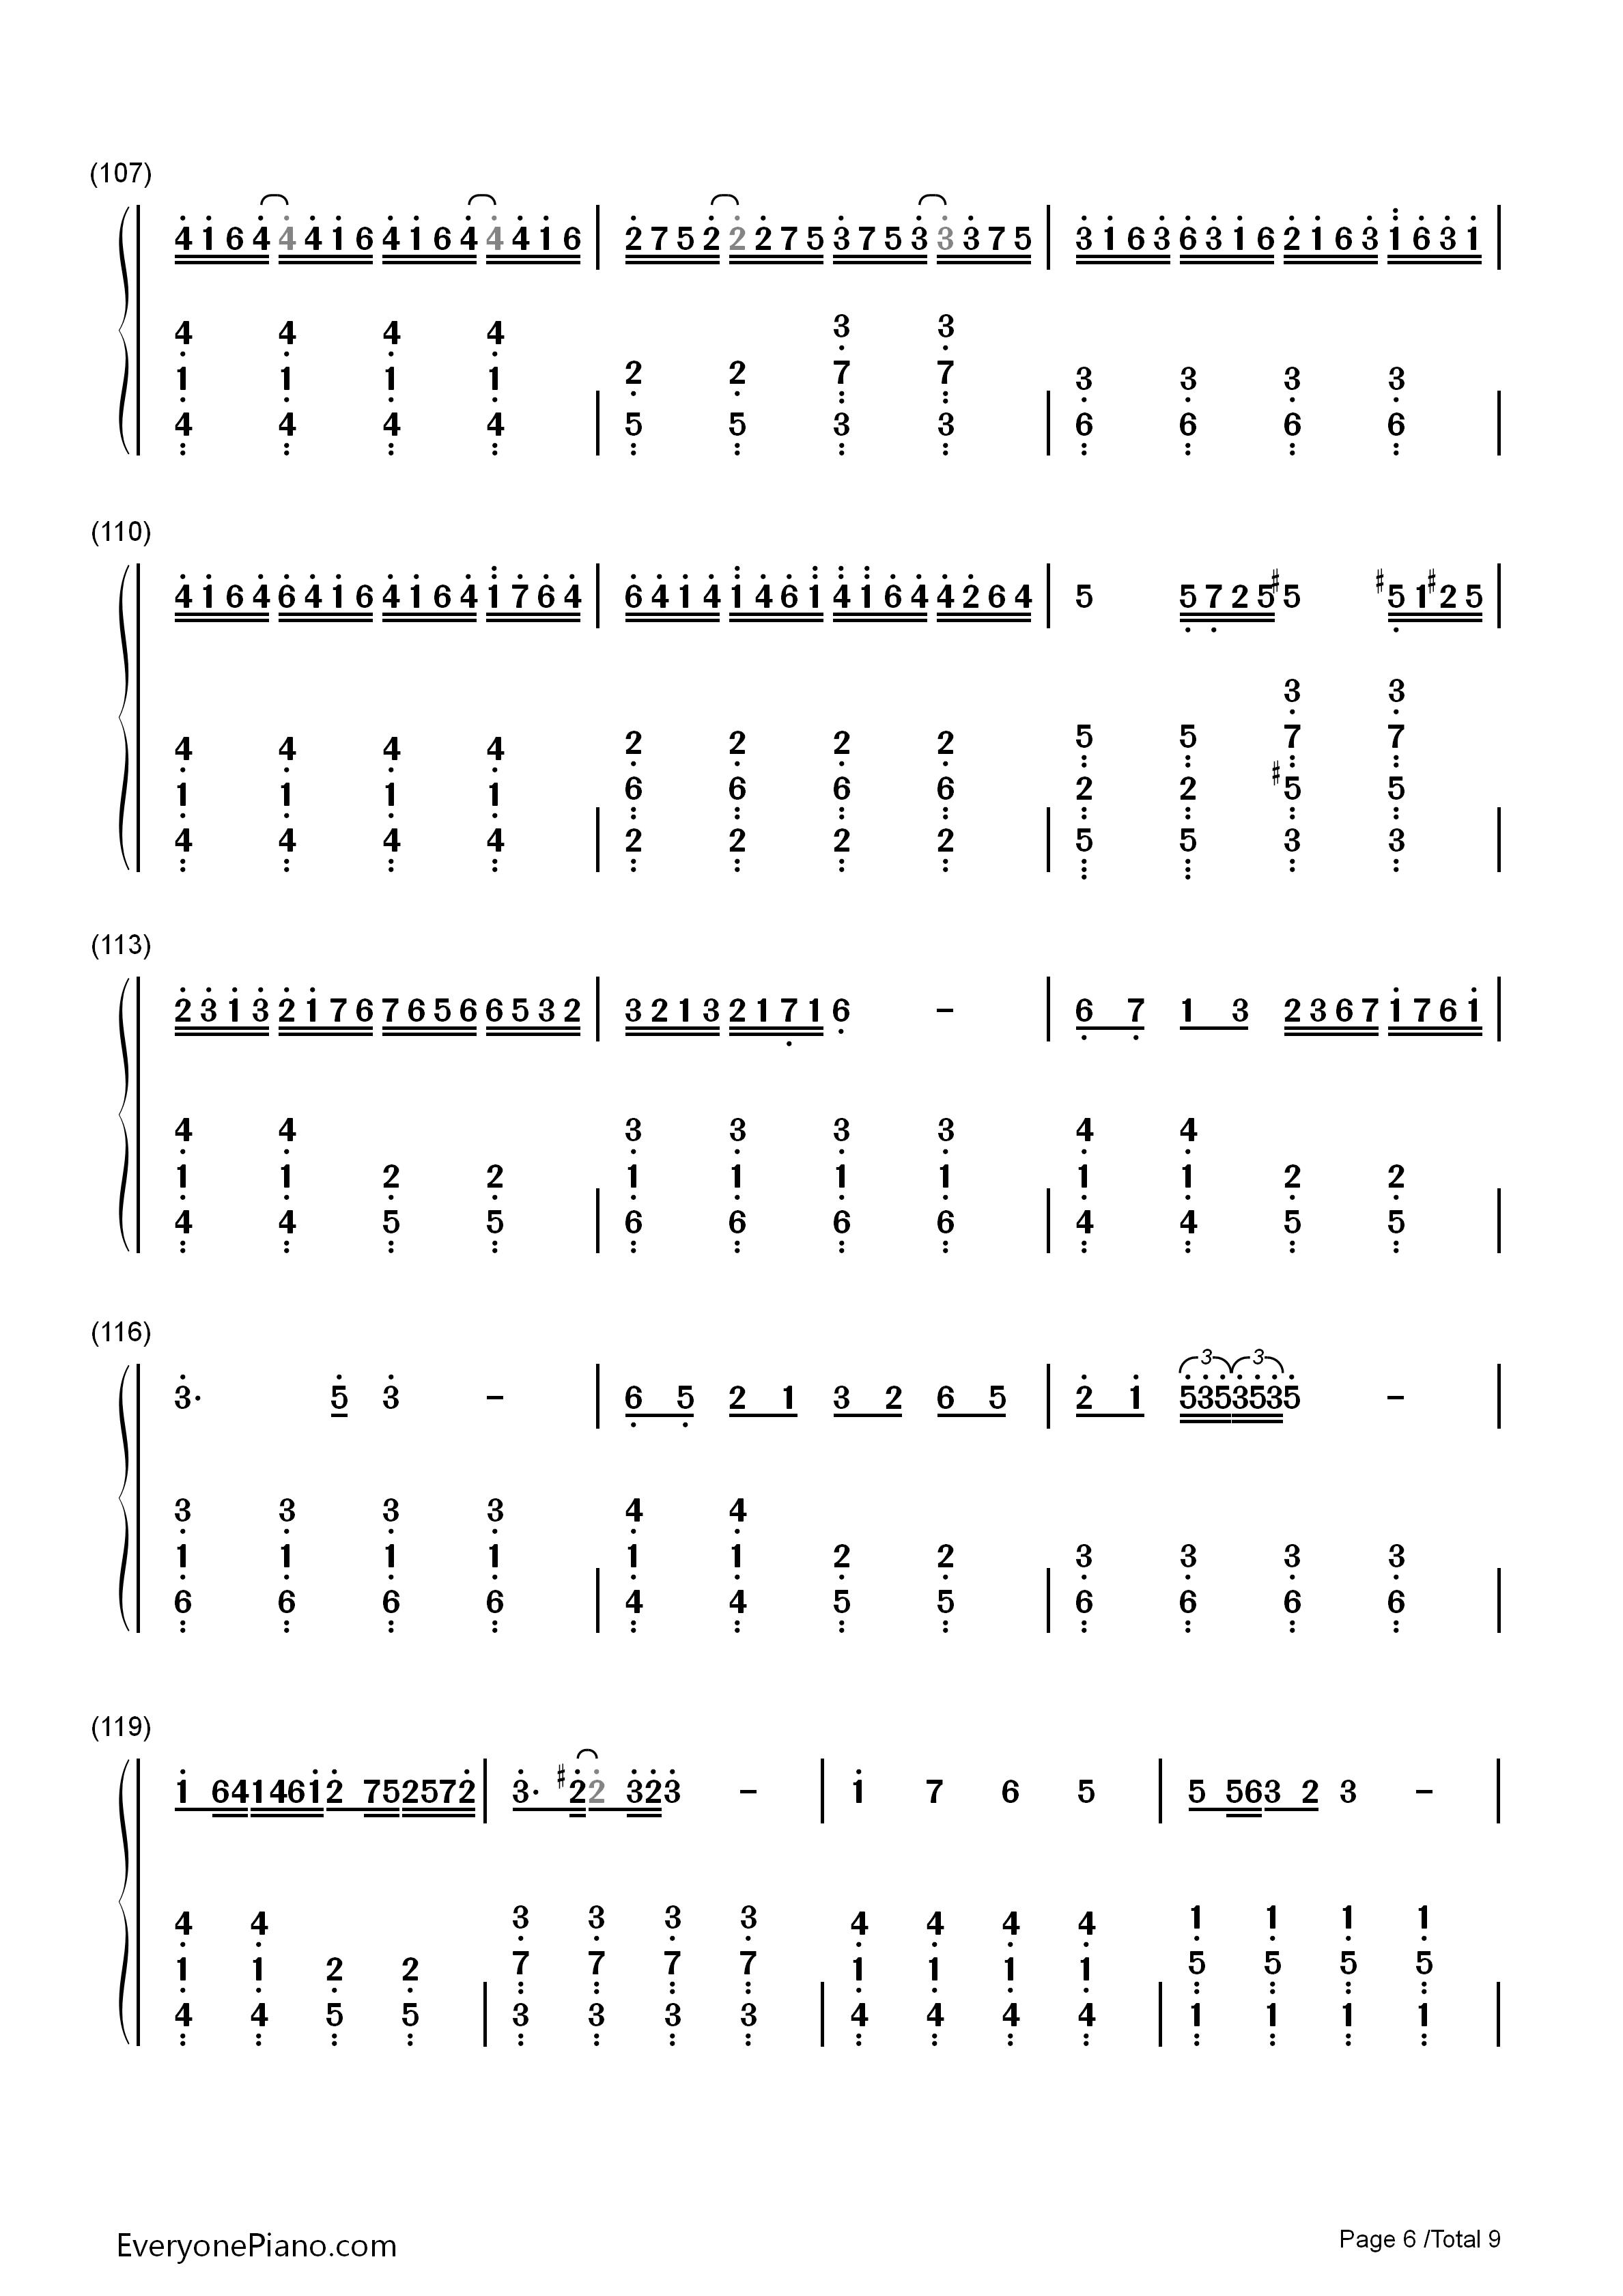 Senbonzakura easy version free piano sheet music piano chords senbonzakura easy version numbered musical notation preview 6 hexwebz Gallery